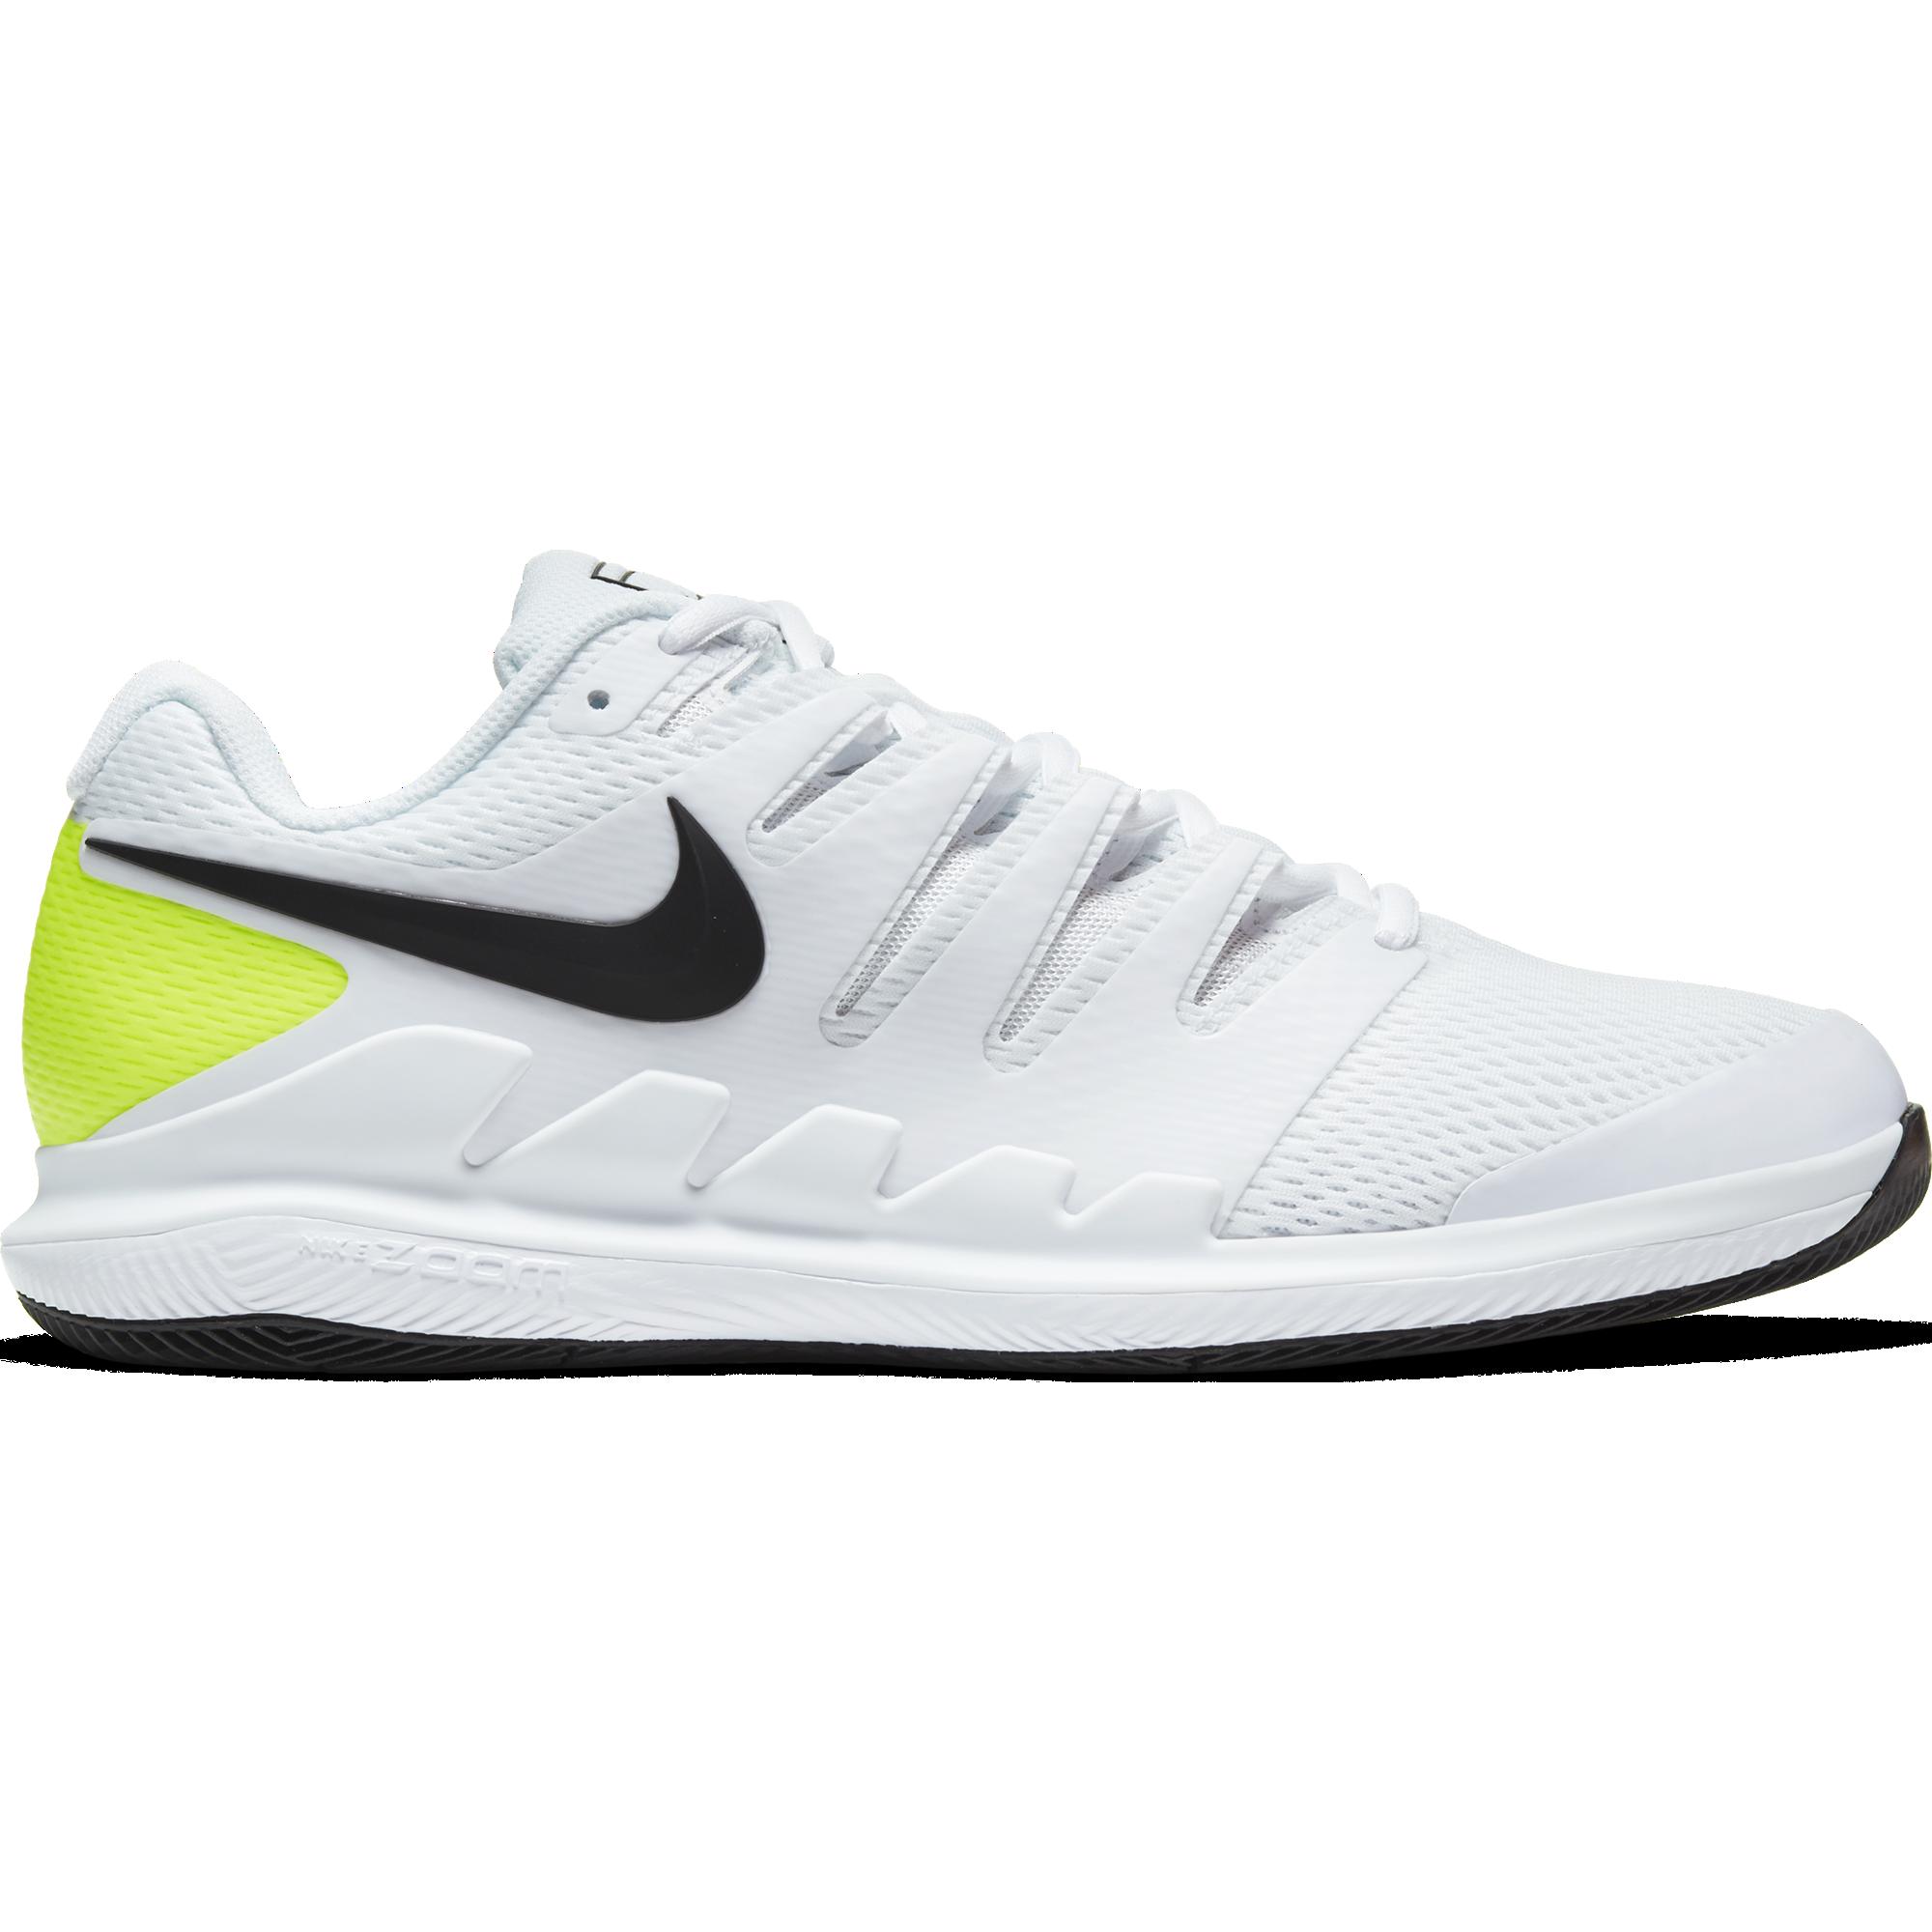 Nike Air Zoom Vapor X Men's Tennis